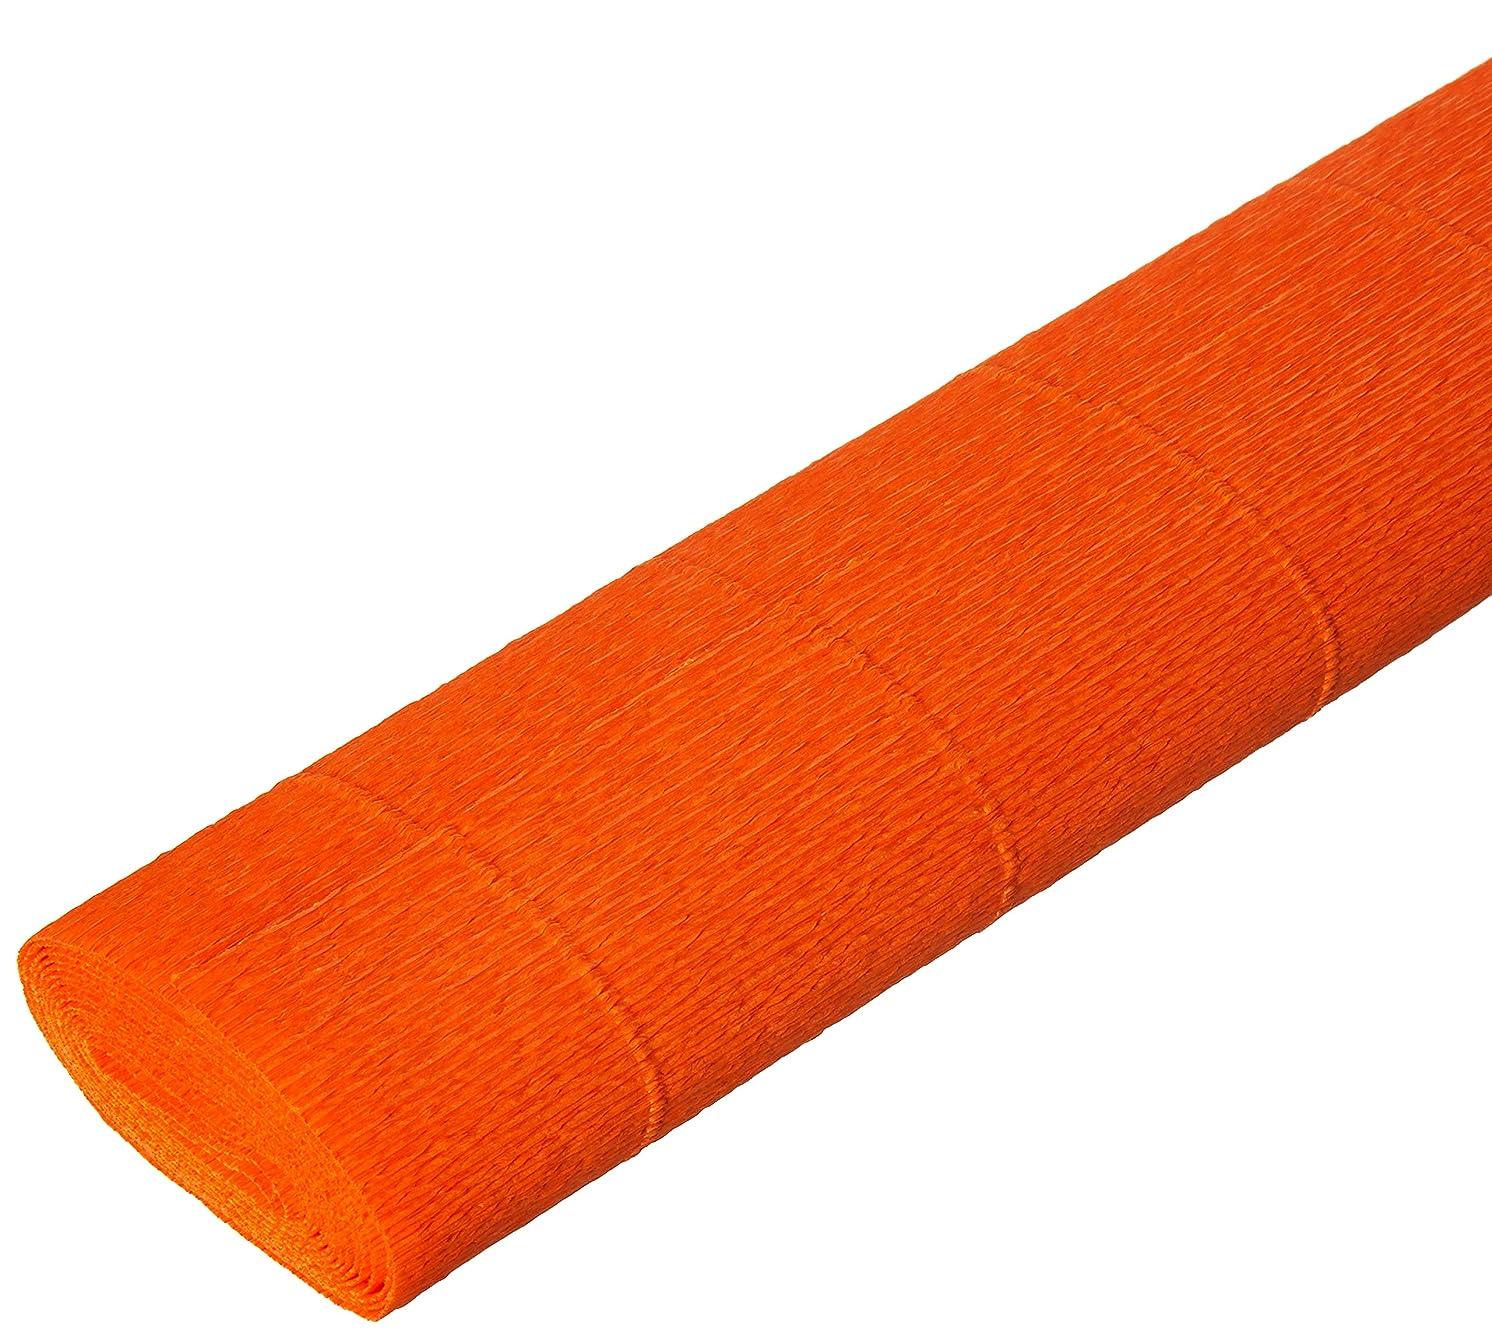 Interdruk BIKW106 Crepe Paper Premium 106 Ciemny Pomarańcz 200 x 50 cm, Multi-Color